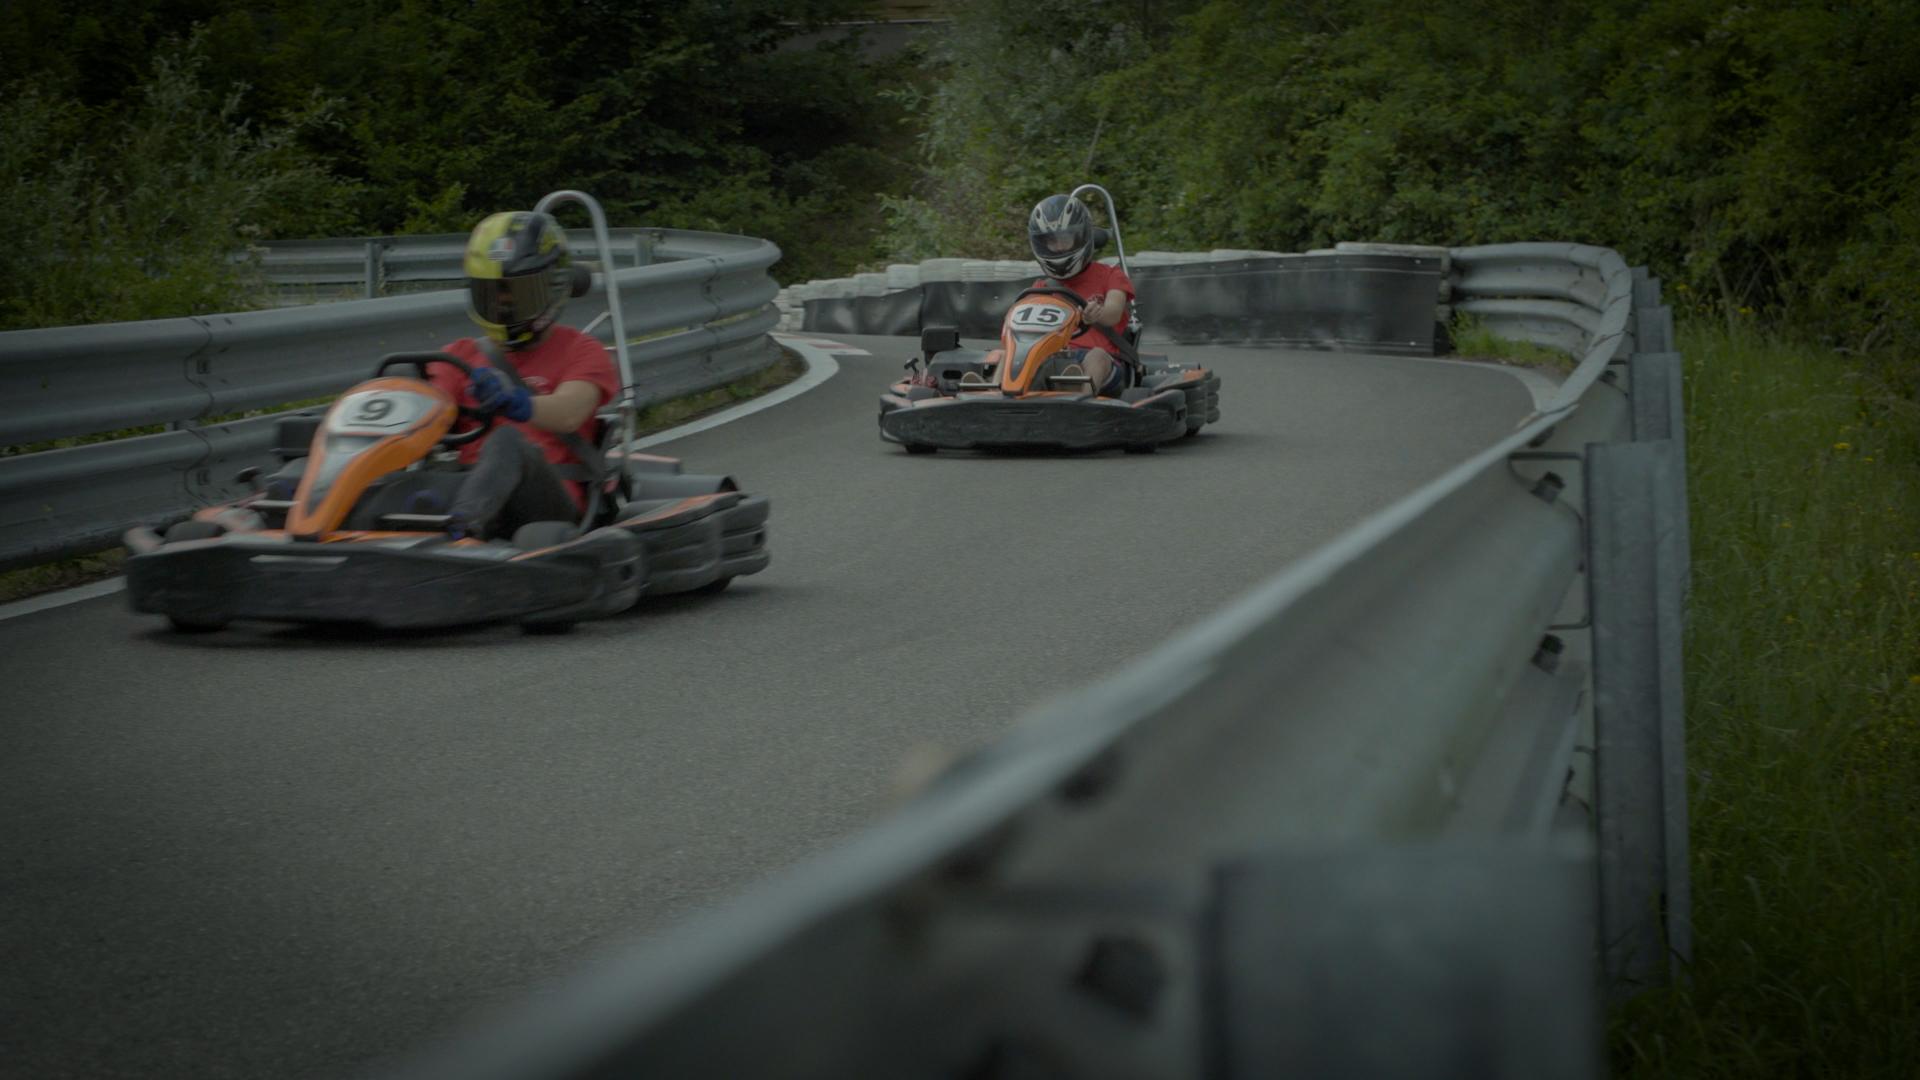 RacingRookie_2018_Vorausscheidung03_Melk_Screenshot_AUTrenalinMEDIA-00.jpg